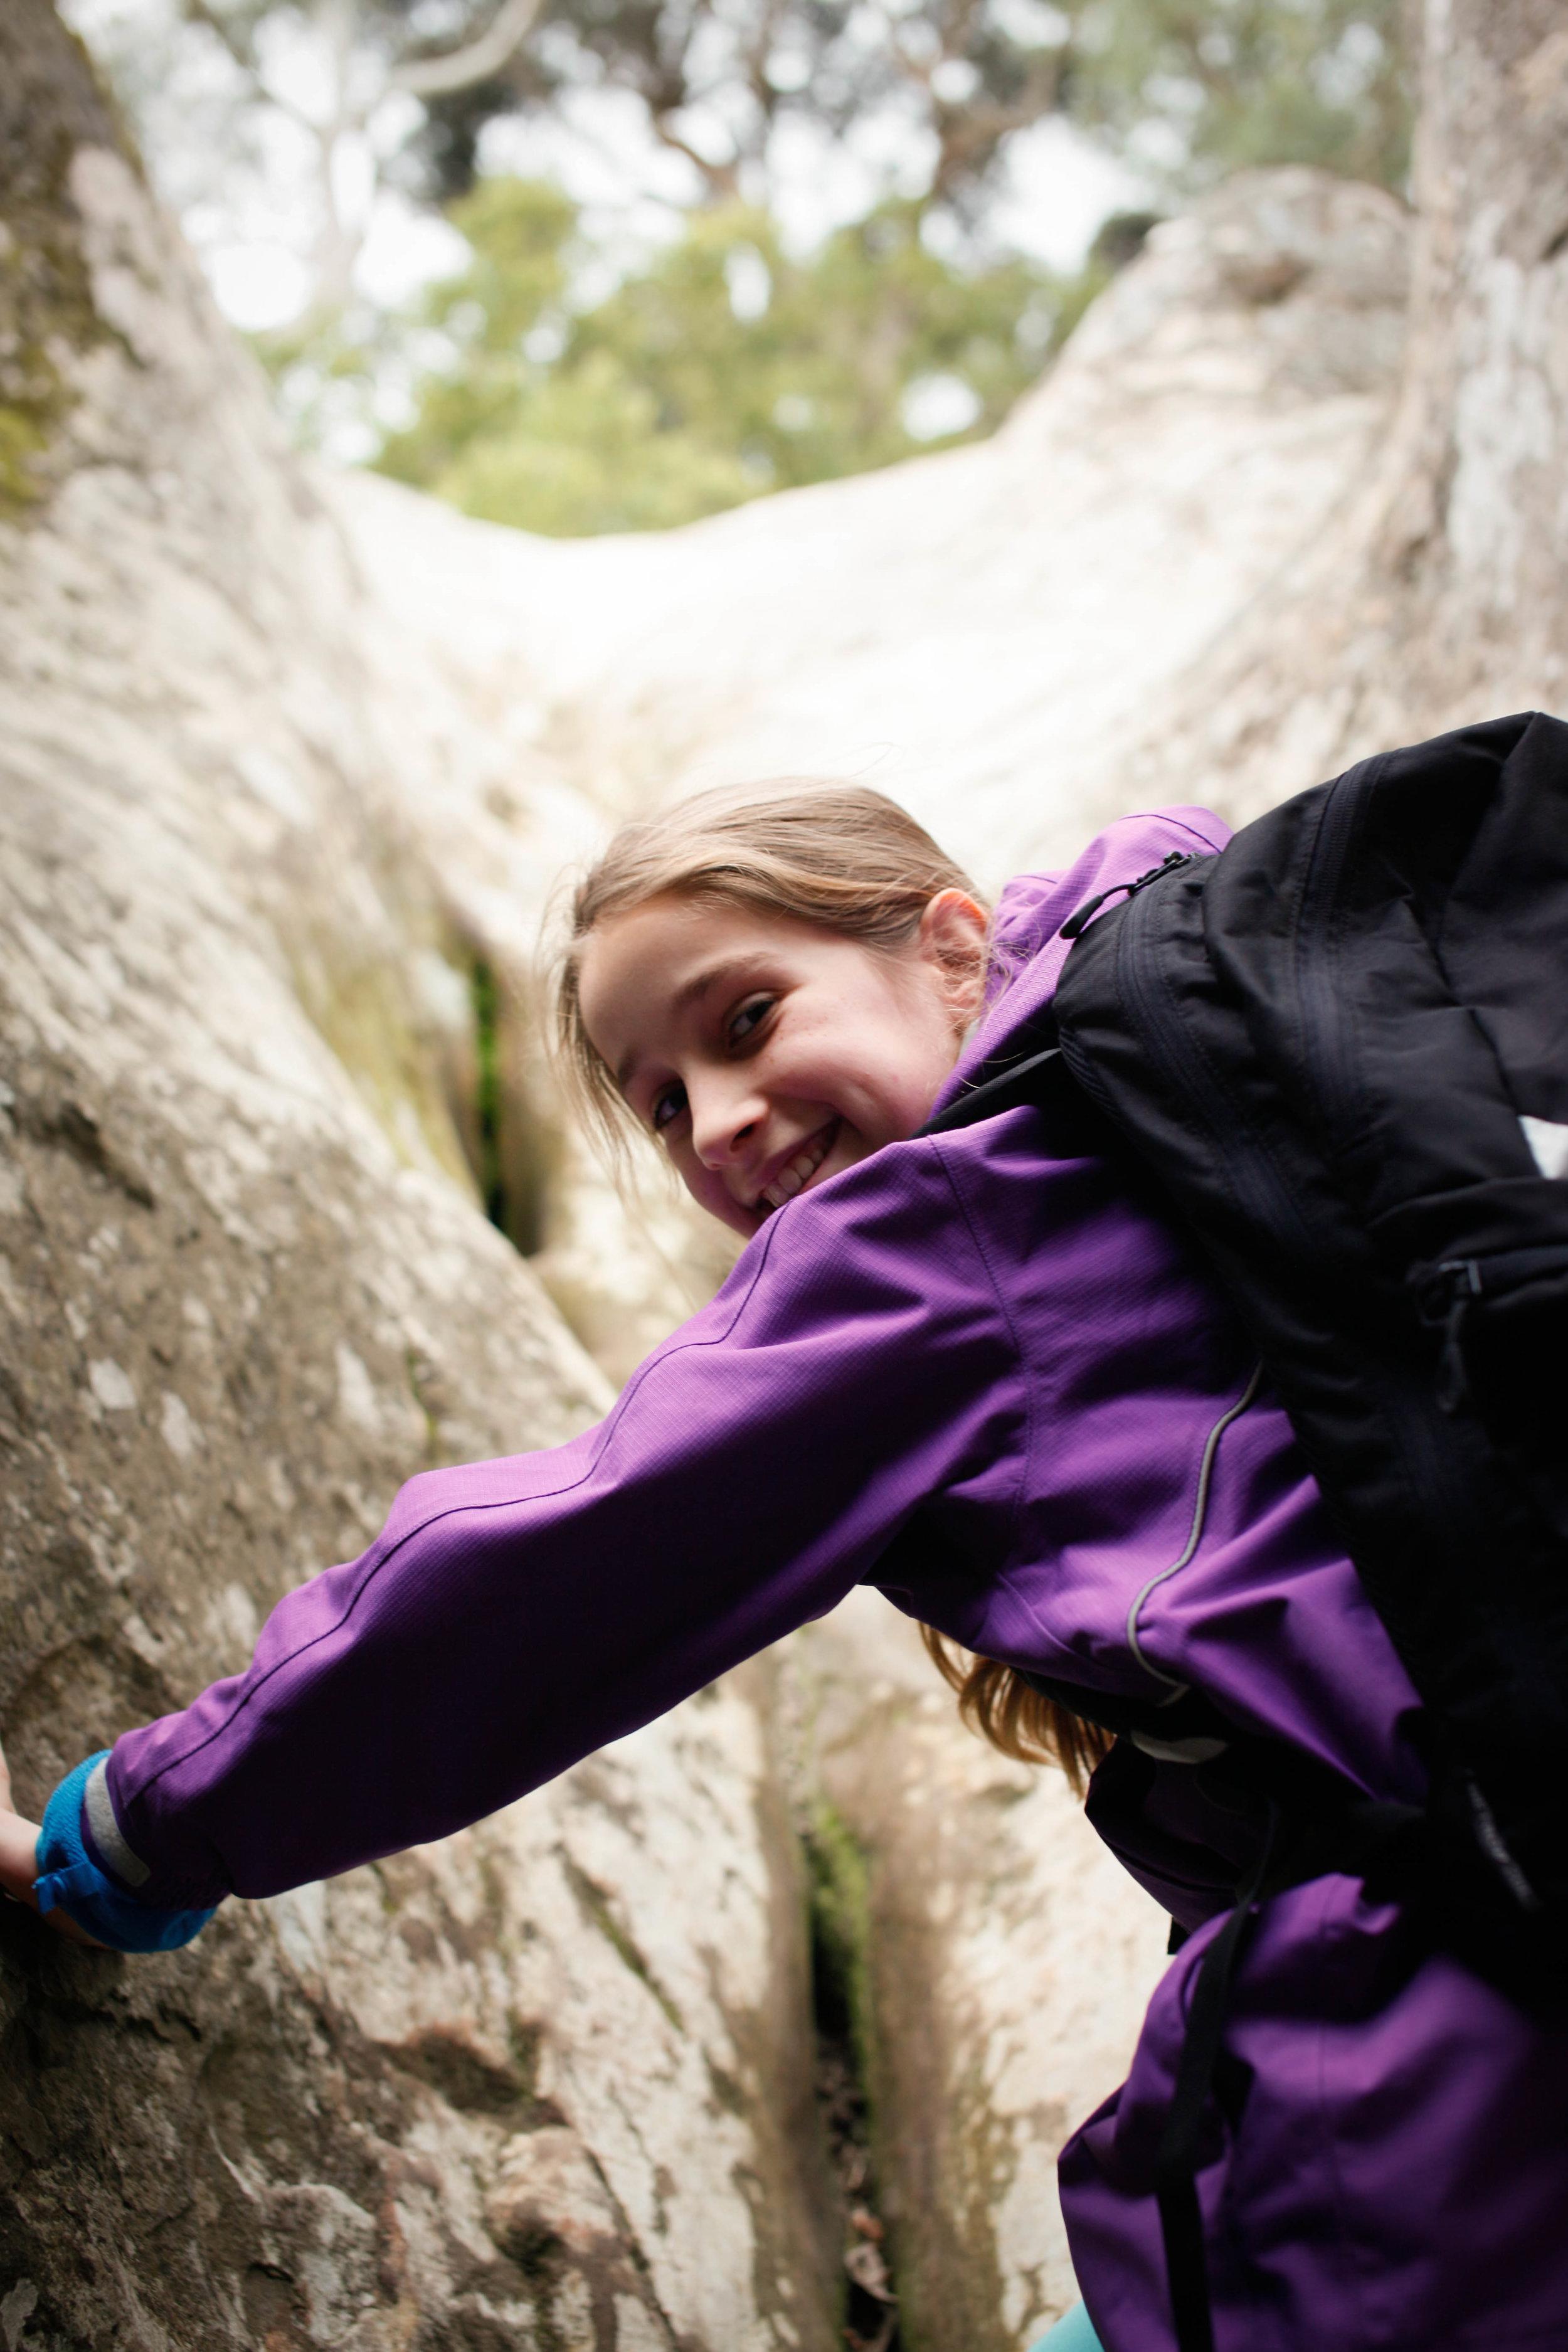 chloe-climbing_21735782540_o.jpg